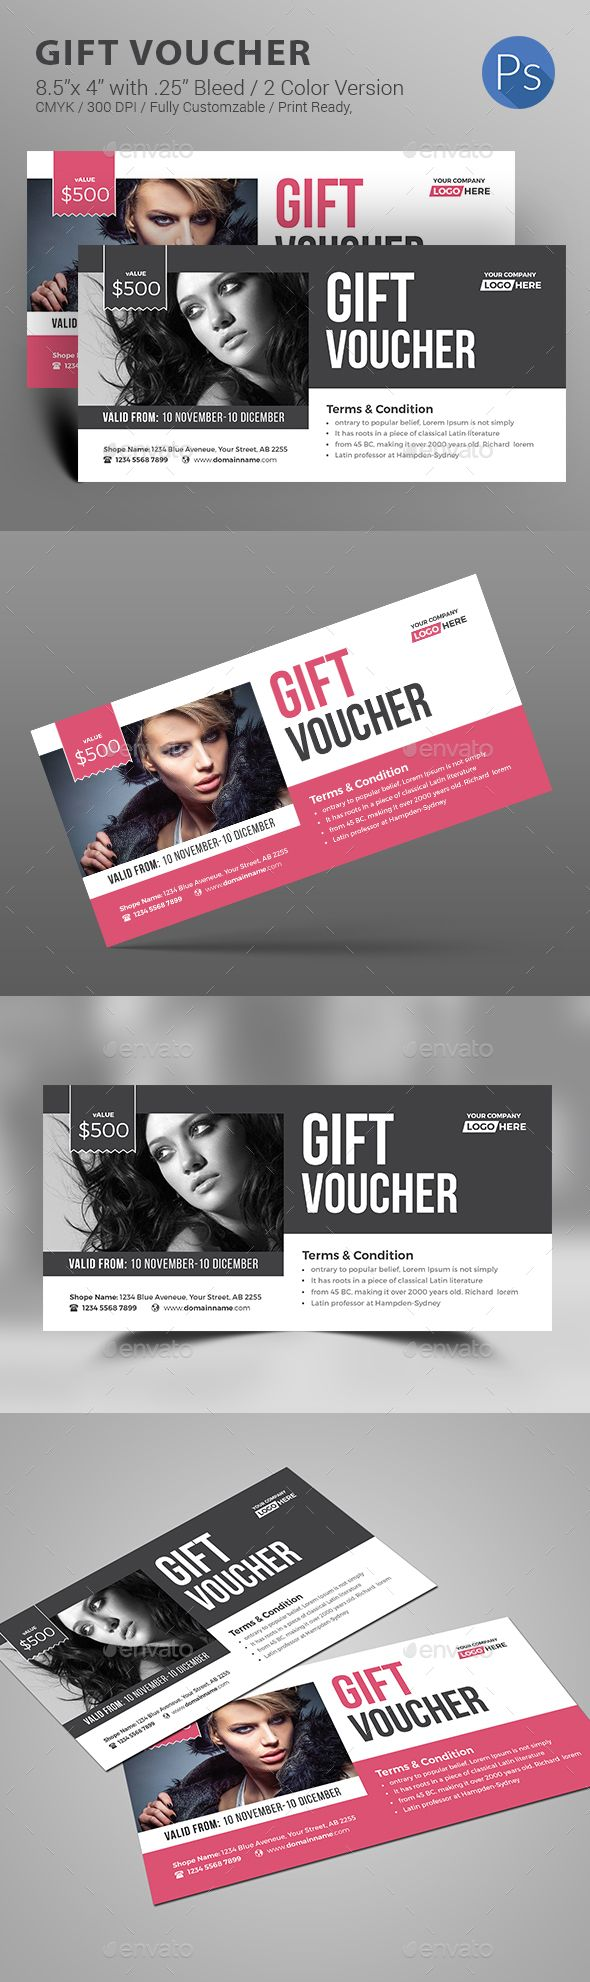 Gift Voucher — Photoshop PSD #beauty card #event • Download ➝ https://graphicriver.net/item/gift-voucher/18792121?ref=pxcr